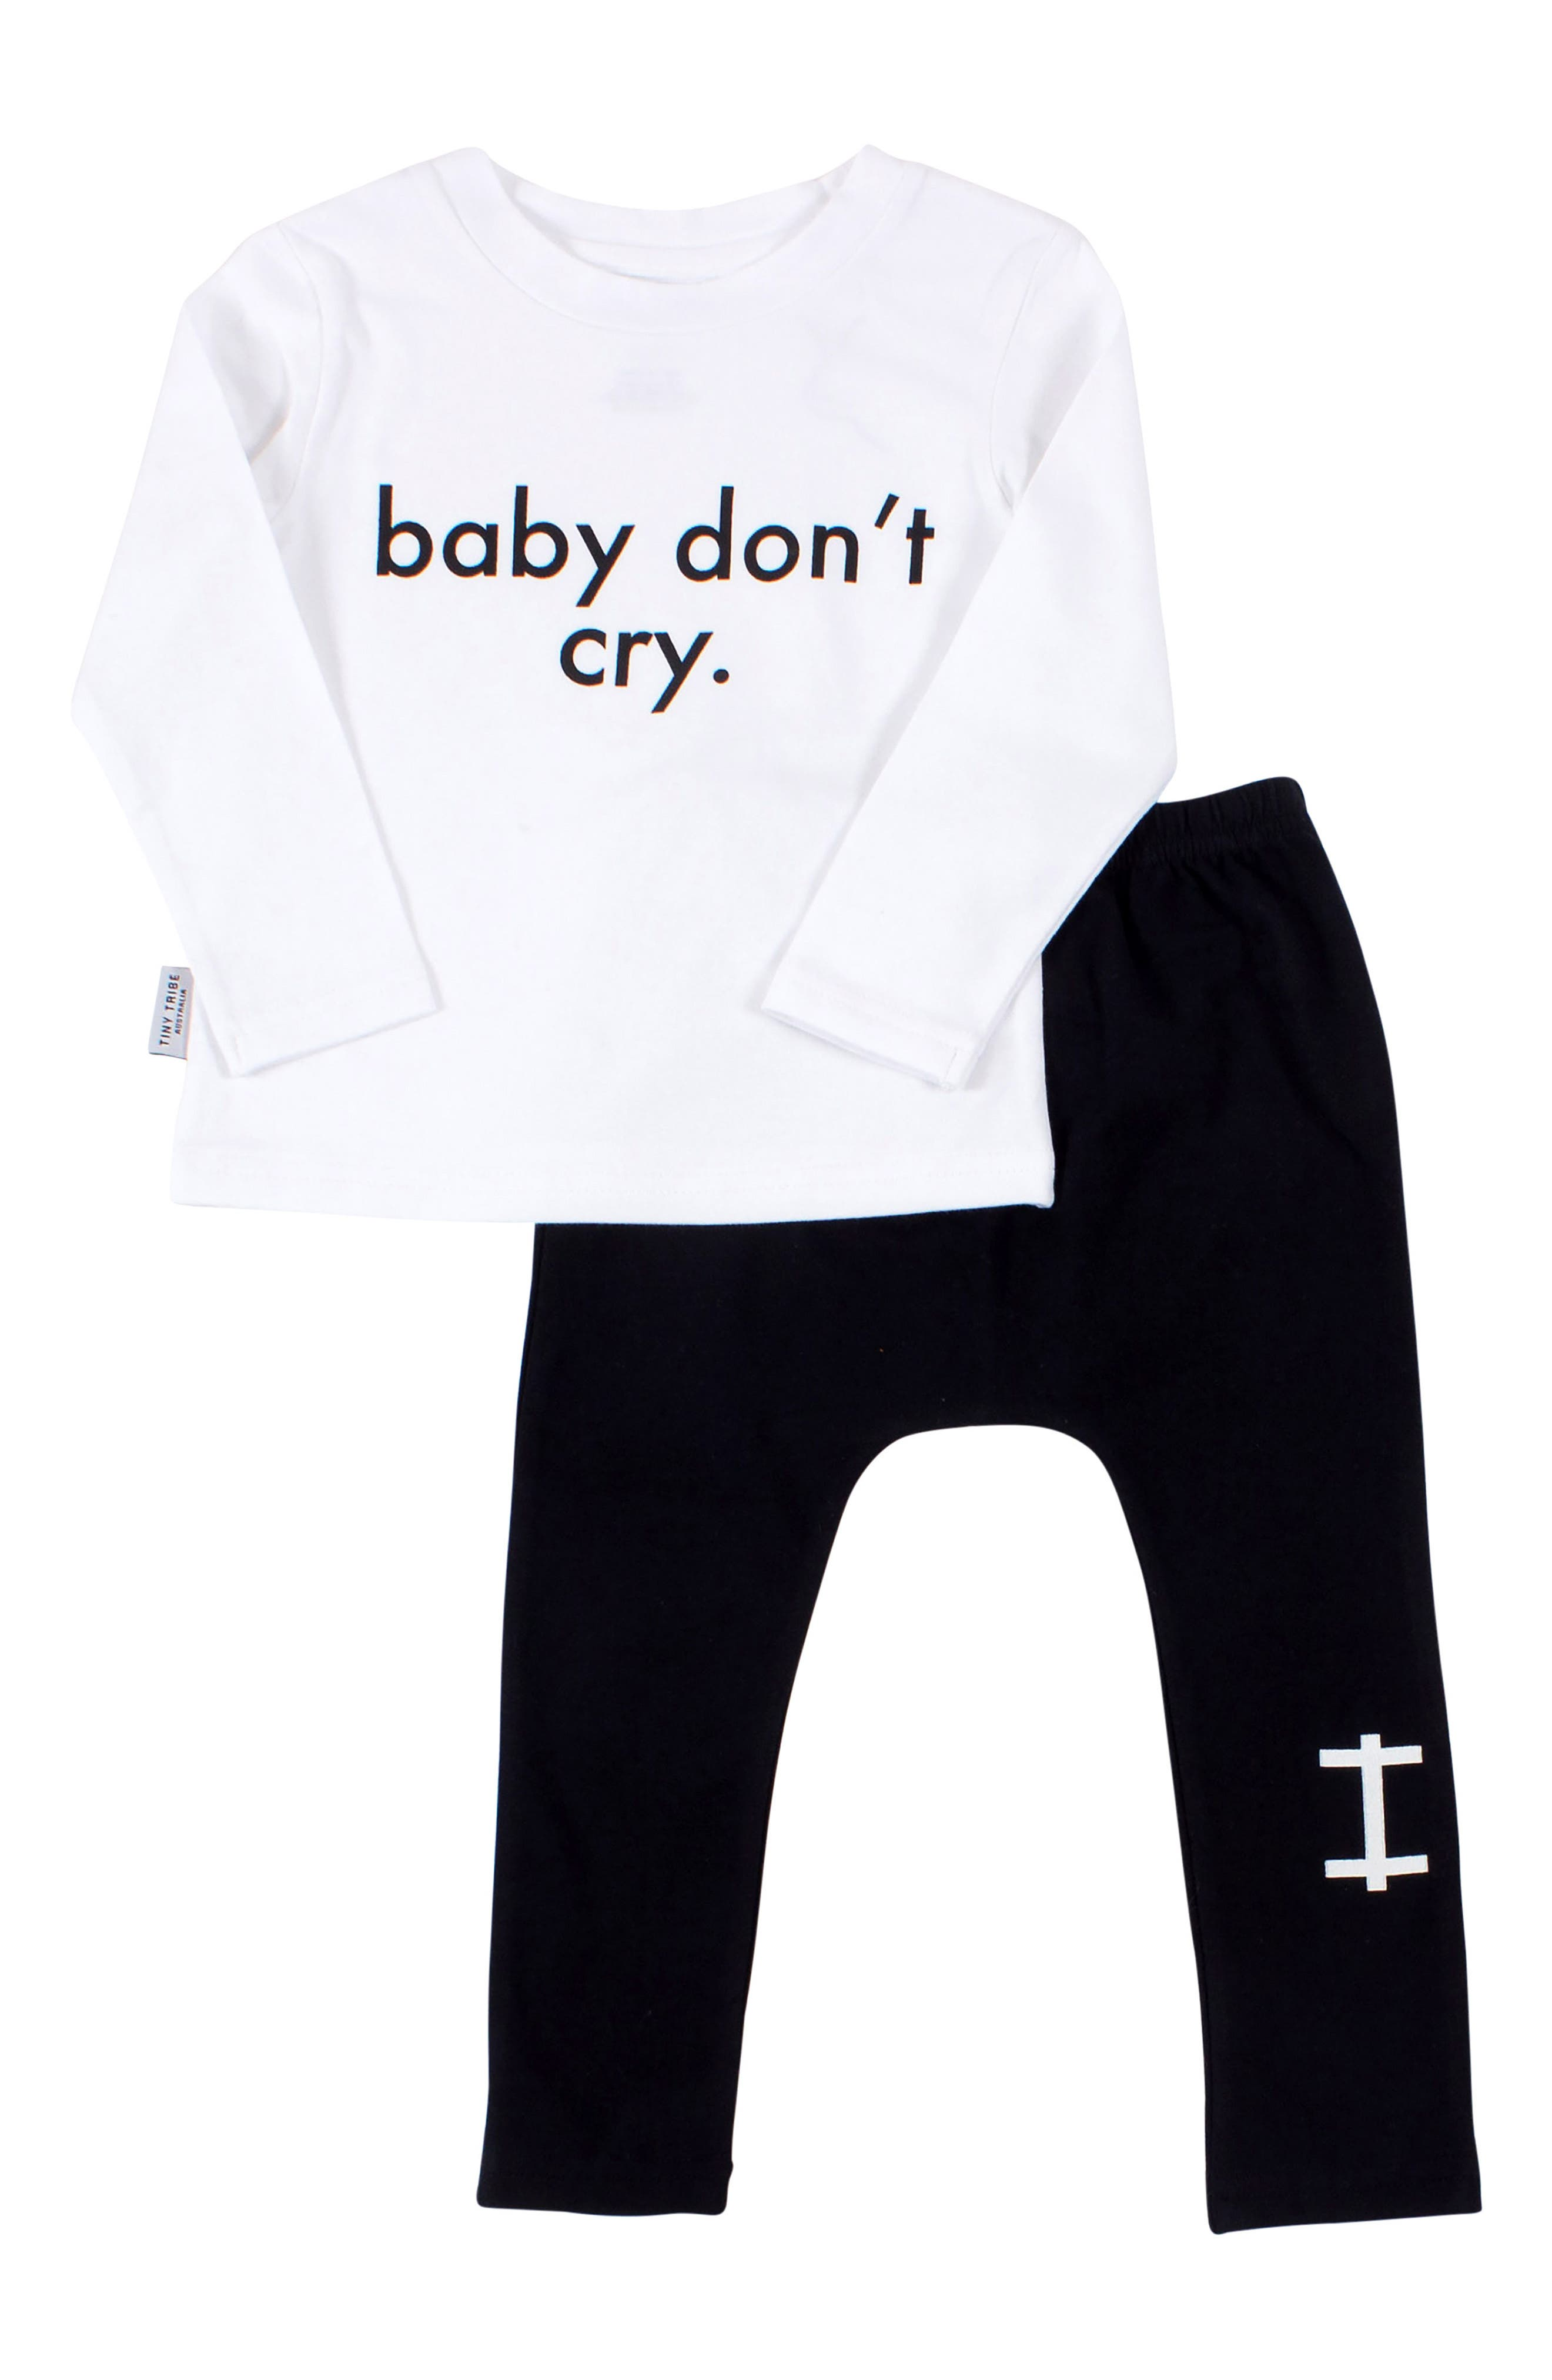 Baby Don't Cry Tee & Leggings Set,                             Main thumbnail 1, color,                             WHITE/ BLACK